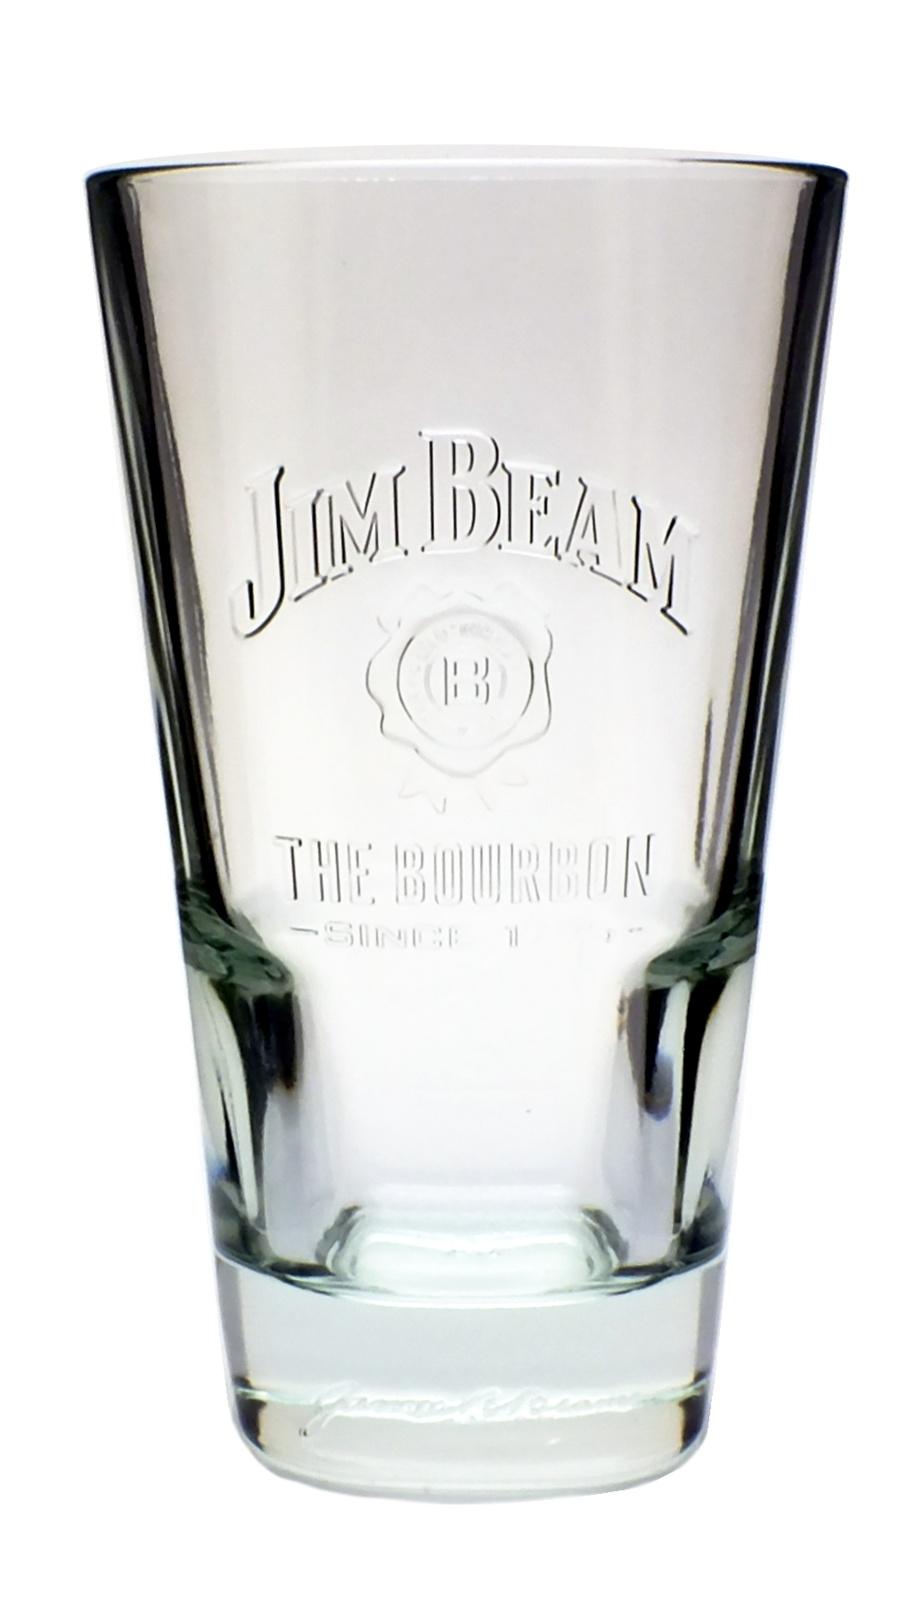 6 piece jim beam long drink glasses 2cl 4cl 6 set whiskey coke glass ebay. Black Bedroom Furniture Sets. Home Design Ideas